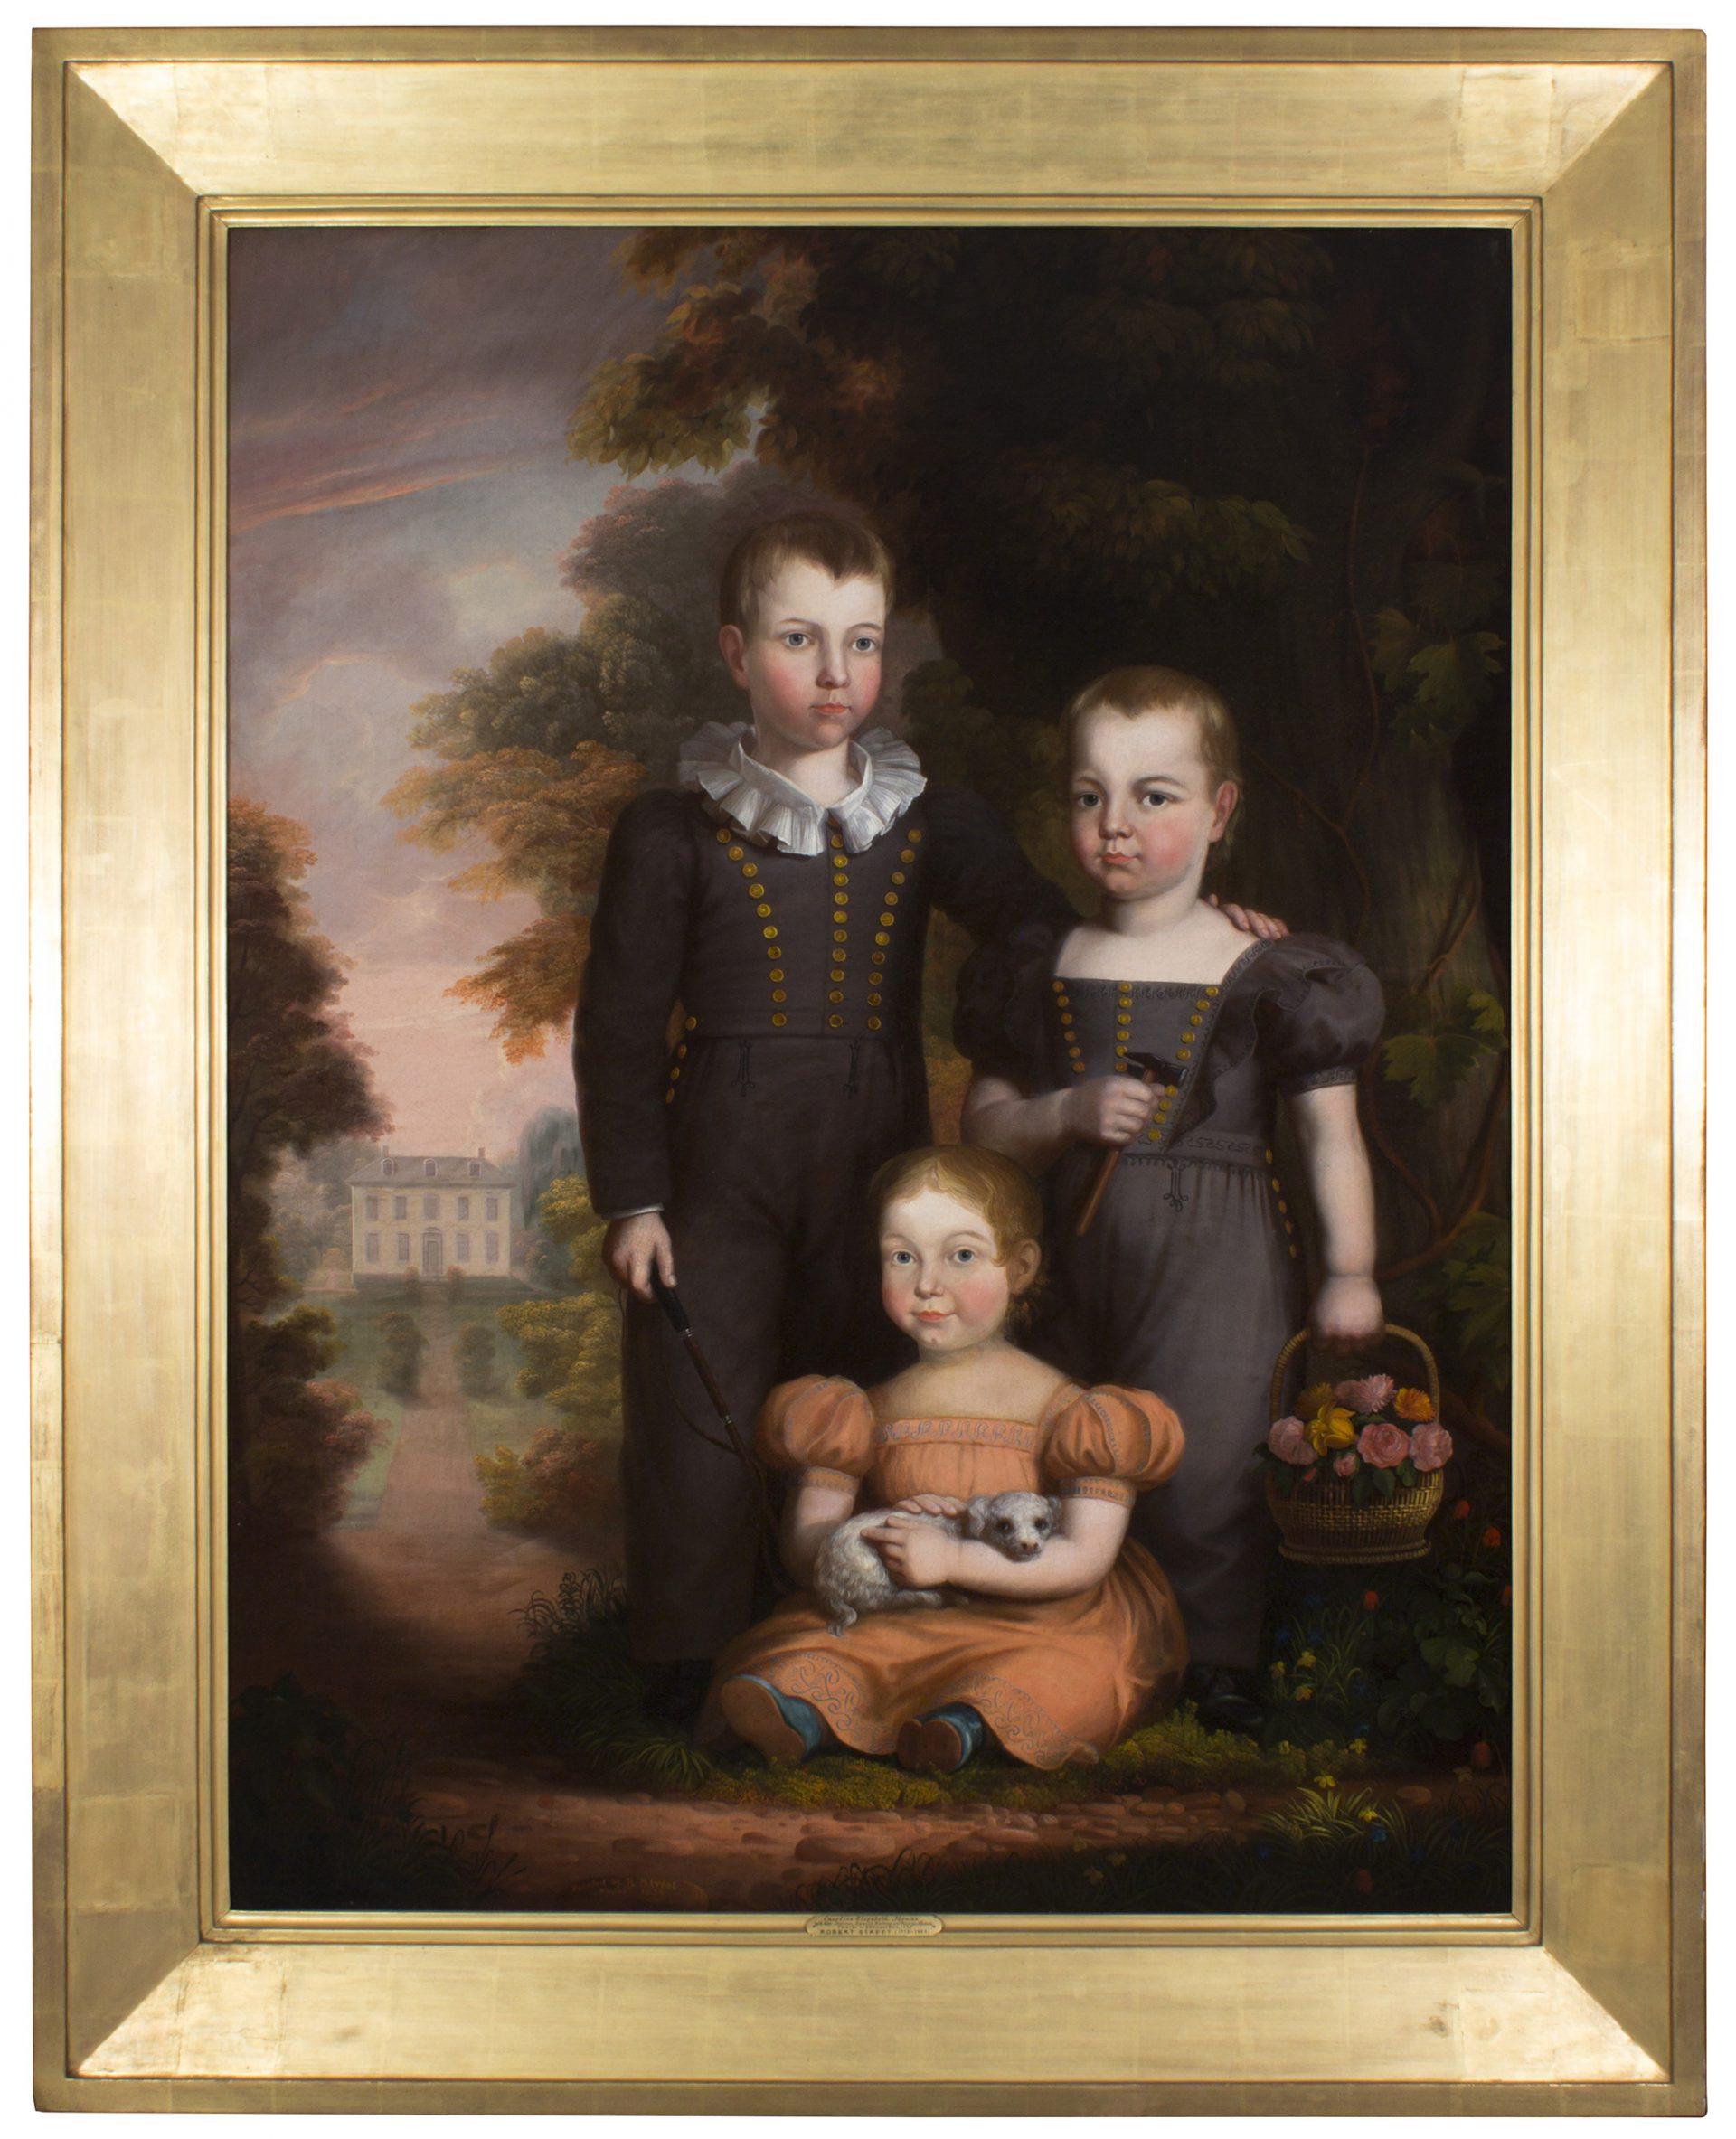 Caroline Elizabeth Thomas with her Brothers FRAMED (Robert Street)